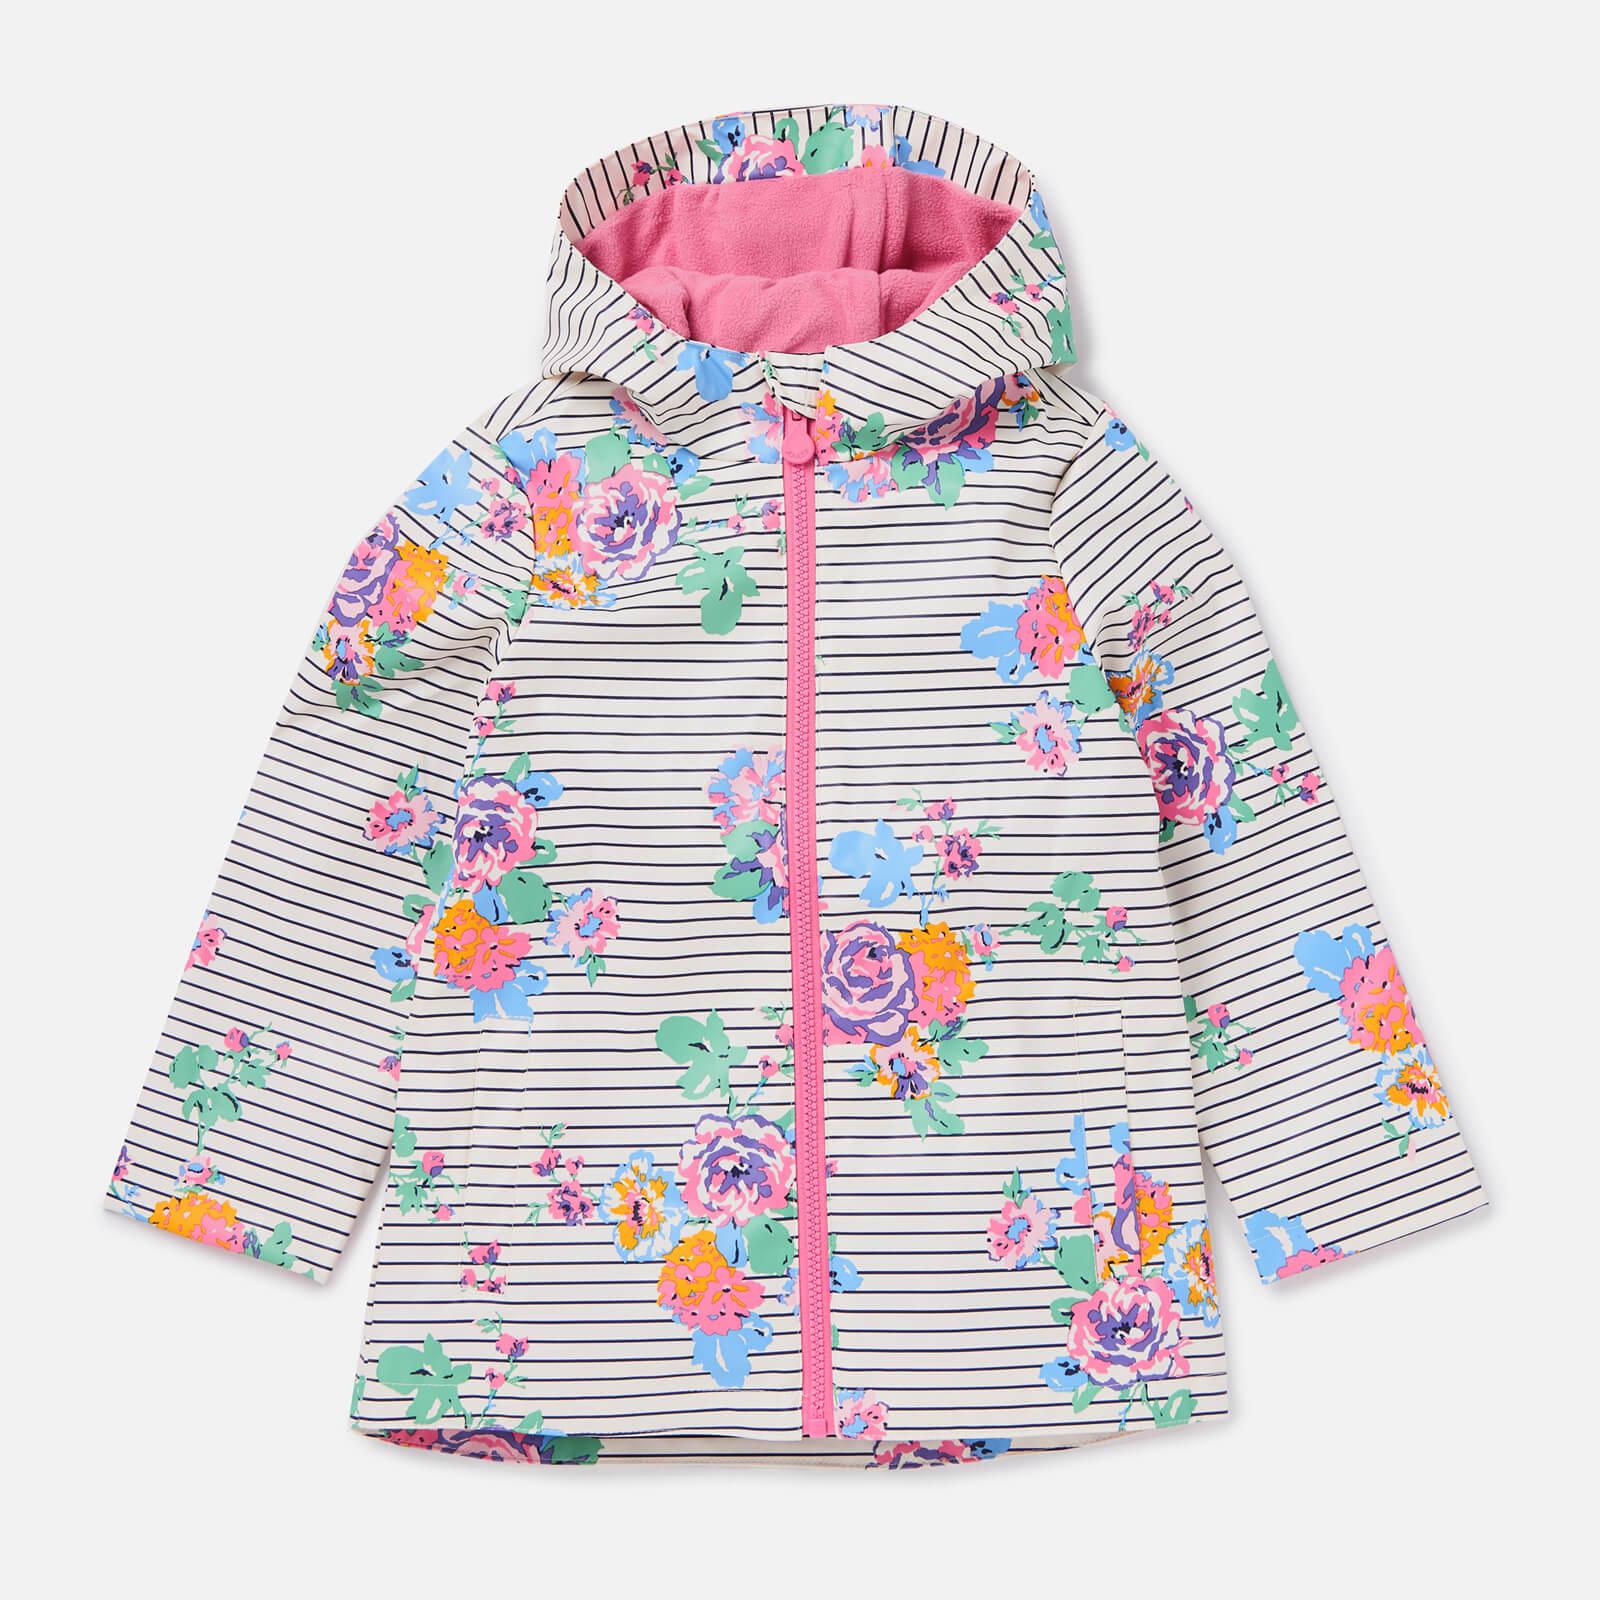 Joules Girls' Raindance Showerproof Rubber Coat - Cream Navy Floral - 1 Year